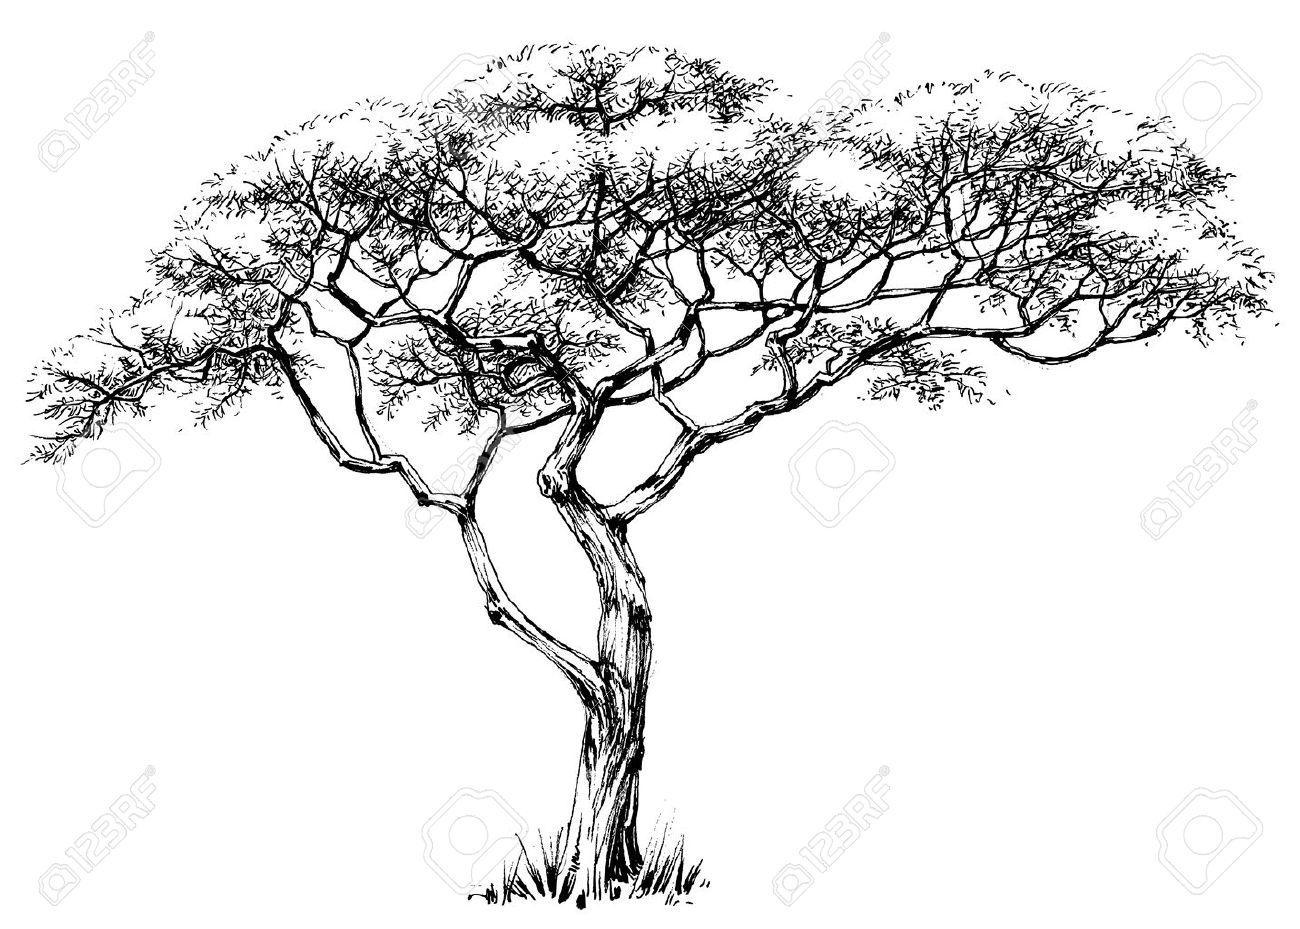 African tree, marula tree - 55852568